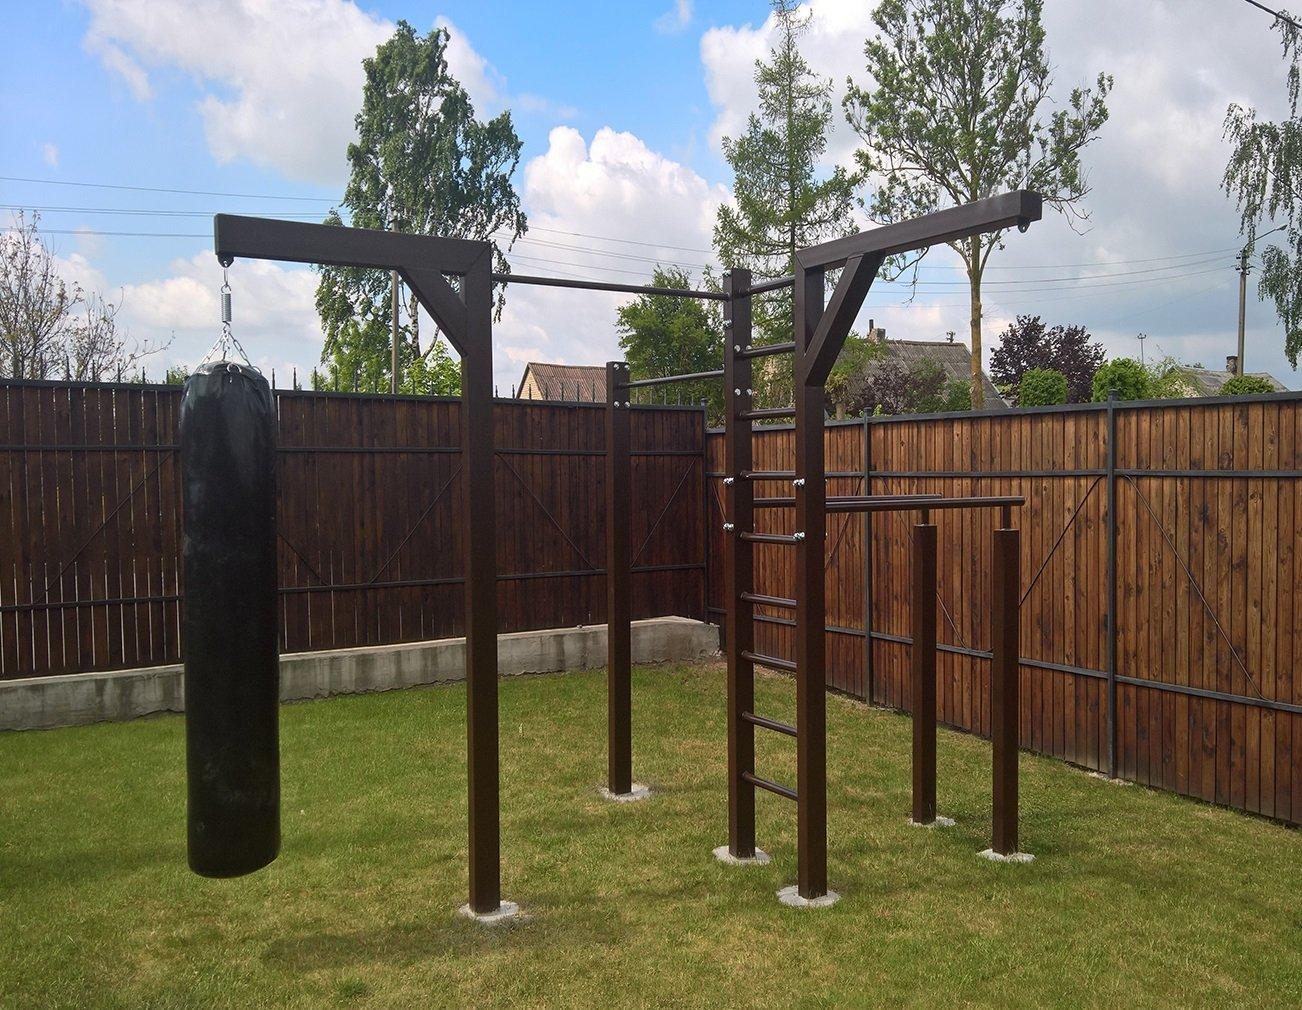 U4 Outdoor Fitness Station